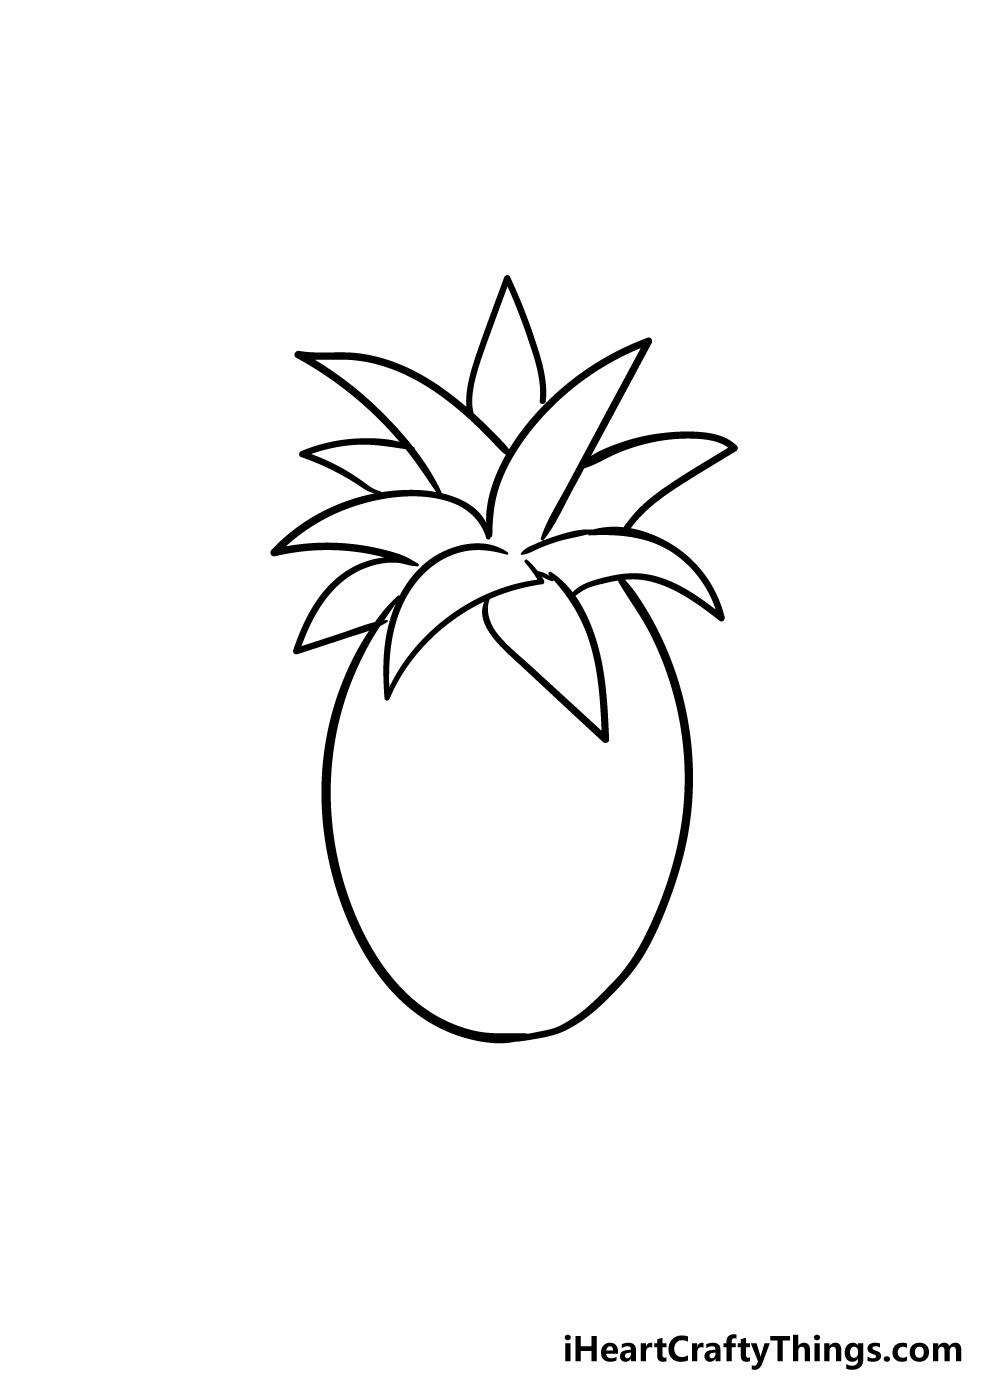 pineapple drawing step 5